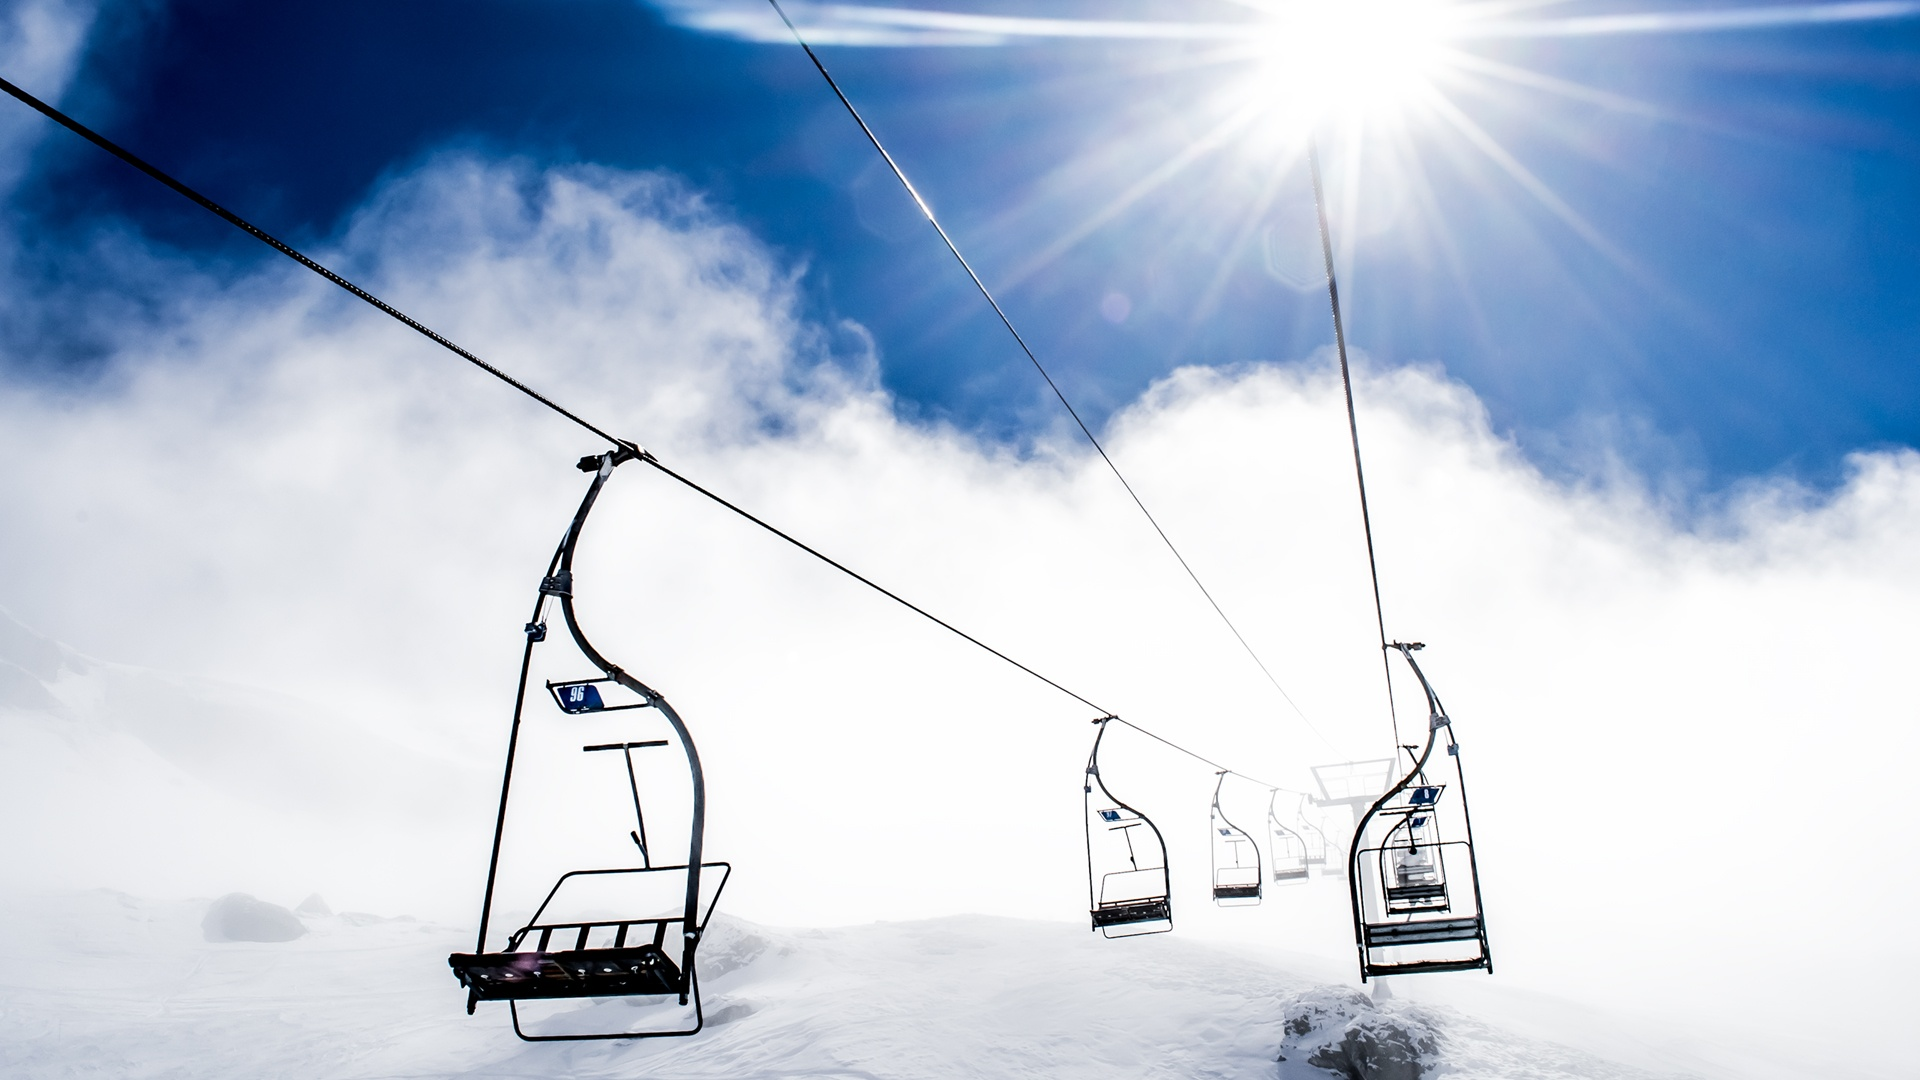 http://3.bp.blogspot.com/--798x0vBrqM/UH5kpnxzSeI/AAAAAAAAMTE/YIofn3FJM9M/s0/mountain-ropeway-ski-resort-1920x1080.jpg